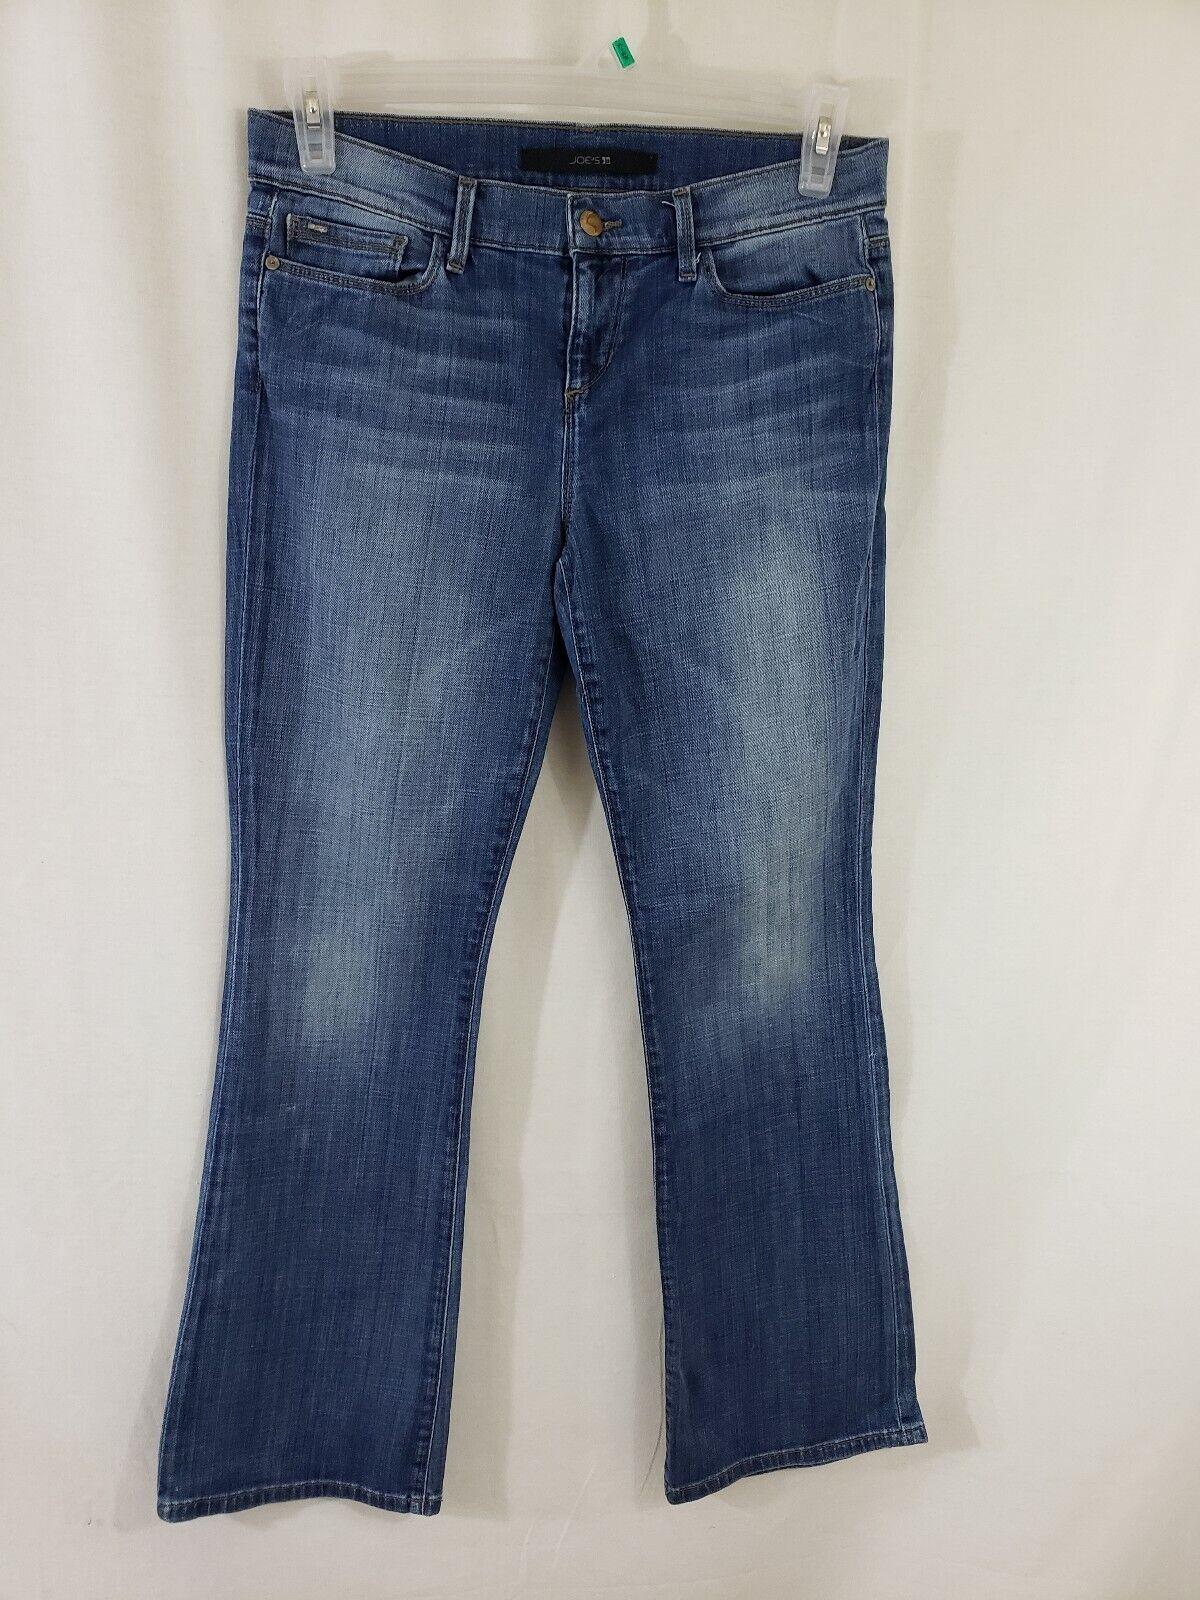 Joes Jeans Provocateur Womens Denim bluee Jeans Size 29 x 31 Boot Cut Medium Wash